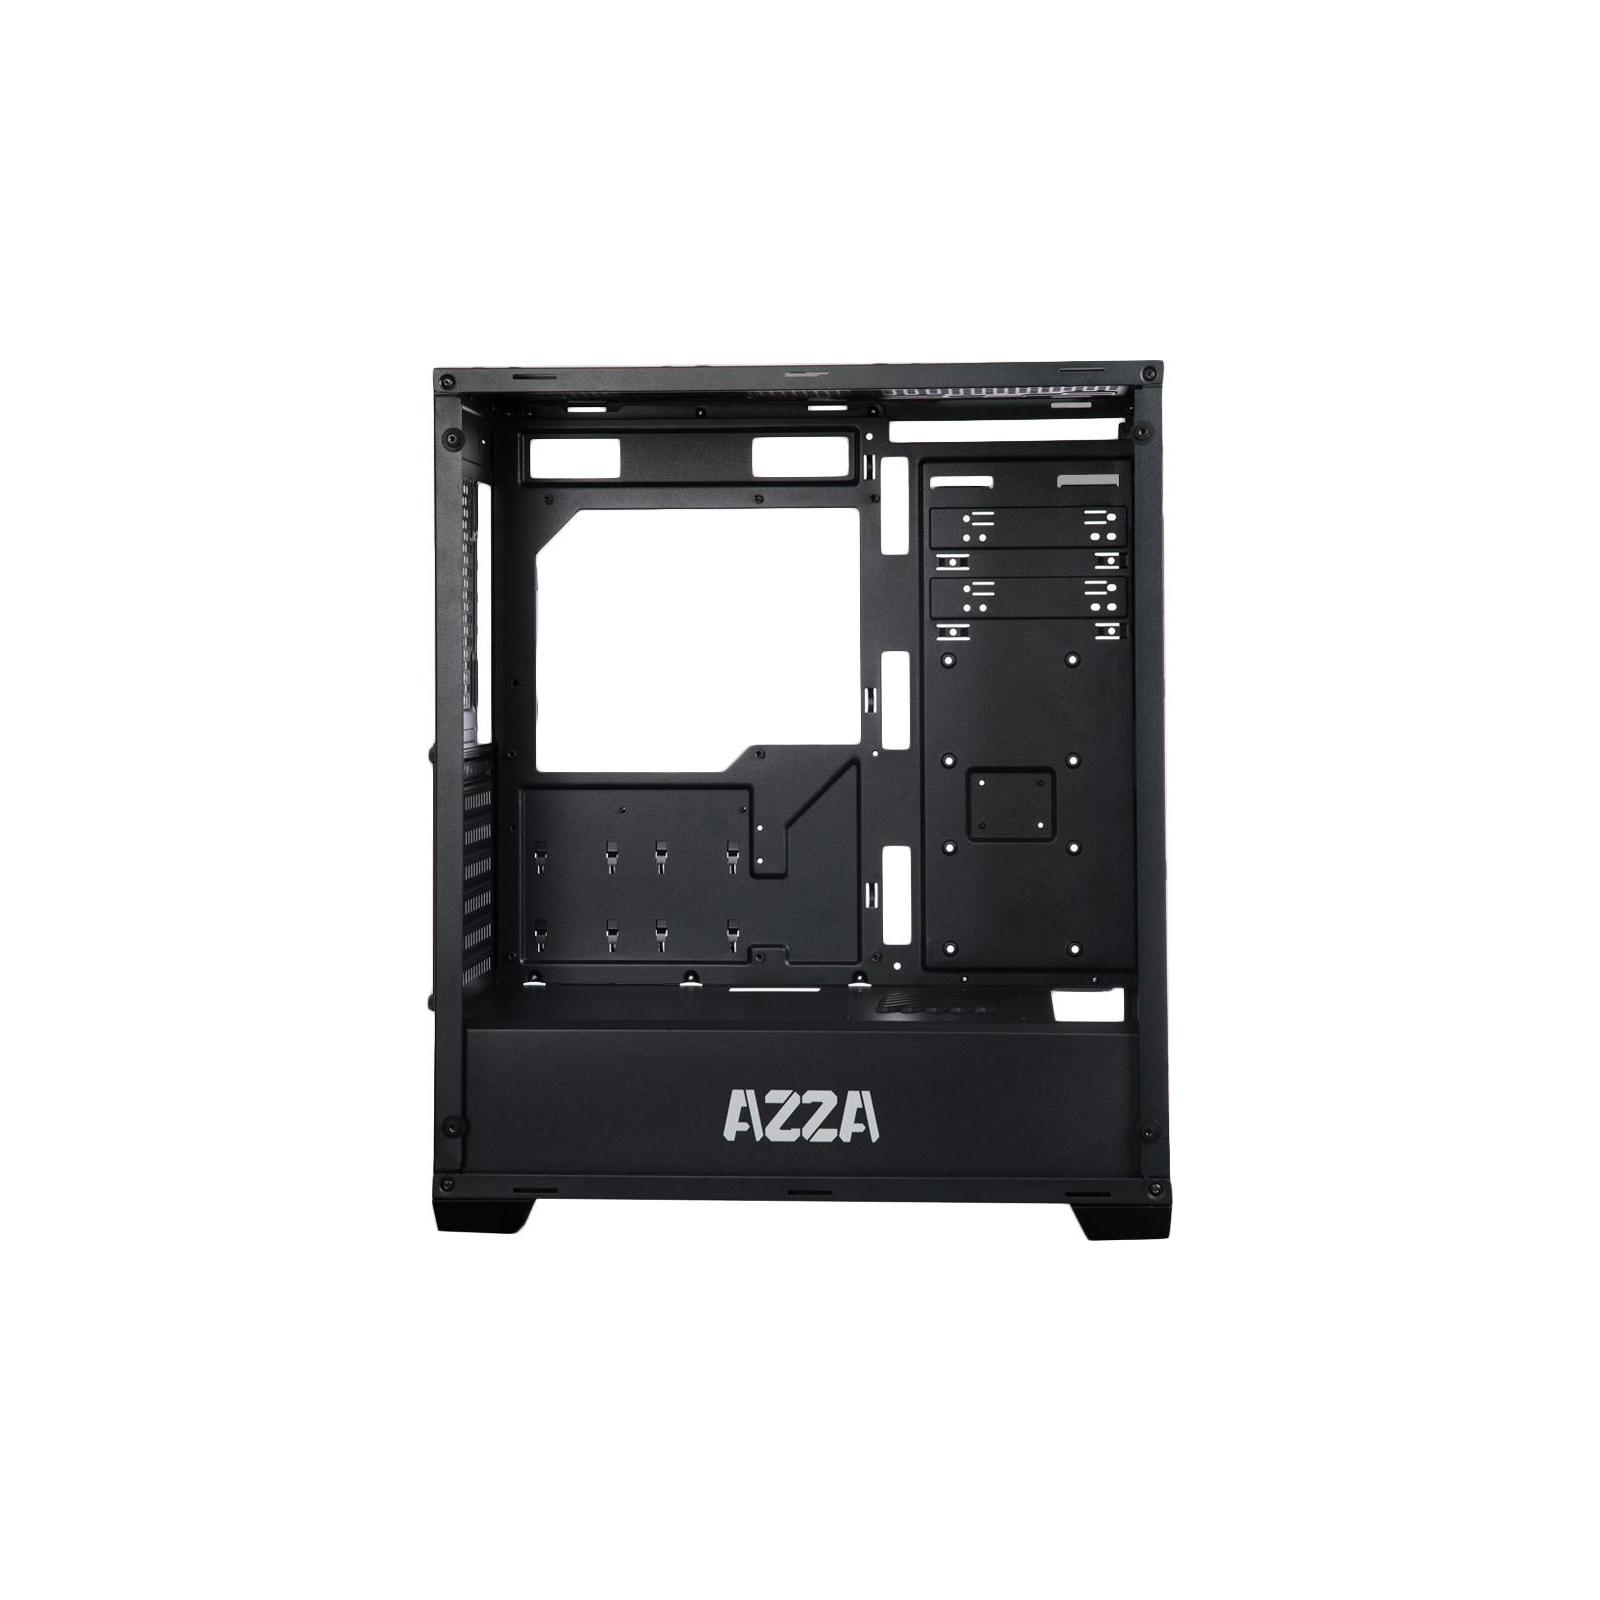 Корпус AZZA Thor 320DH (CSAZ-320DH) изображение 6